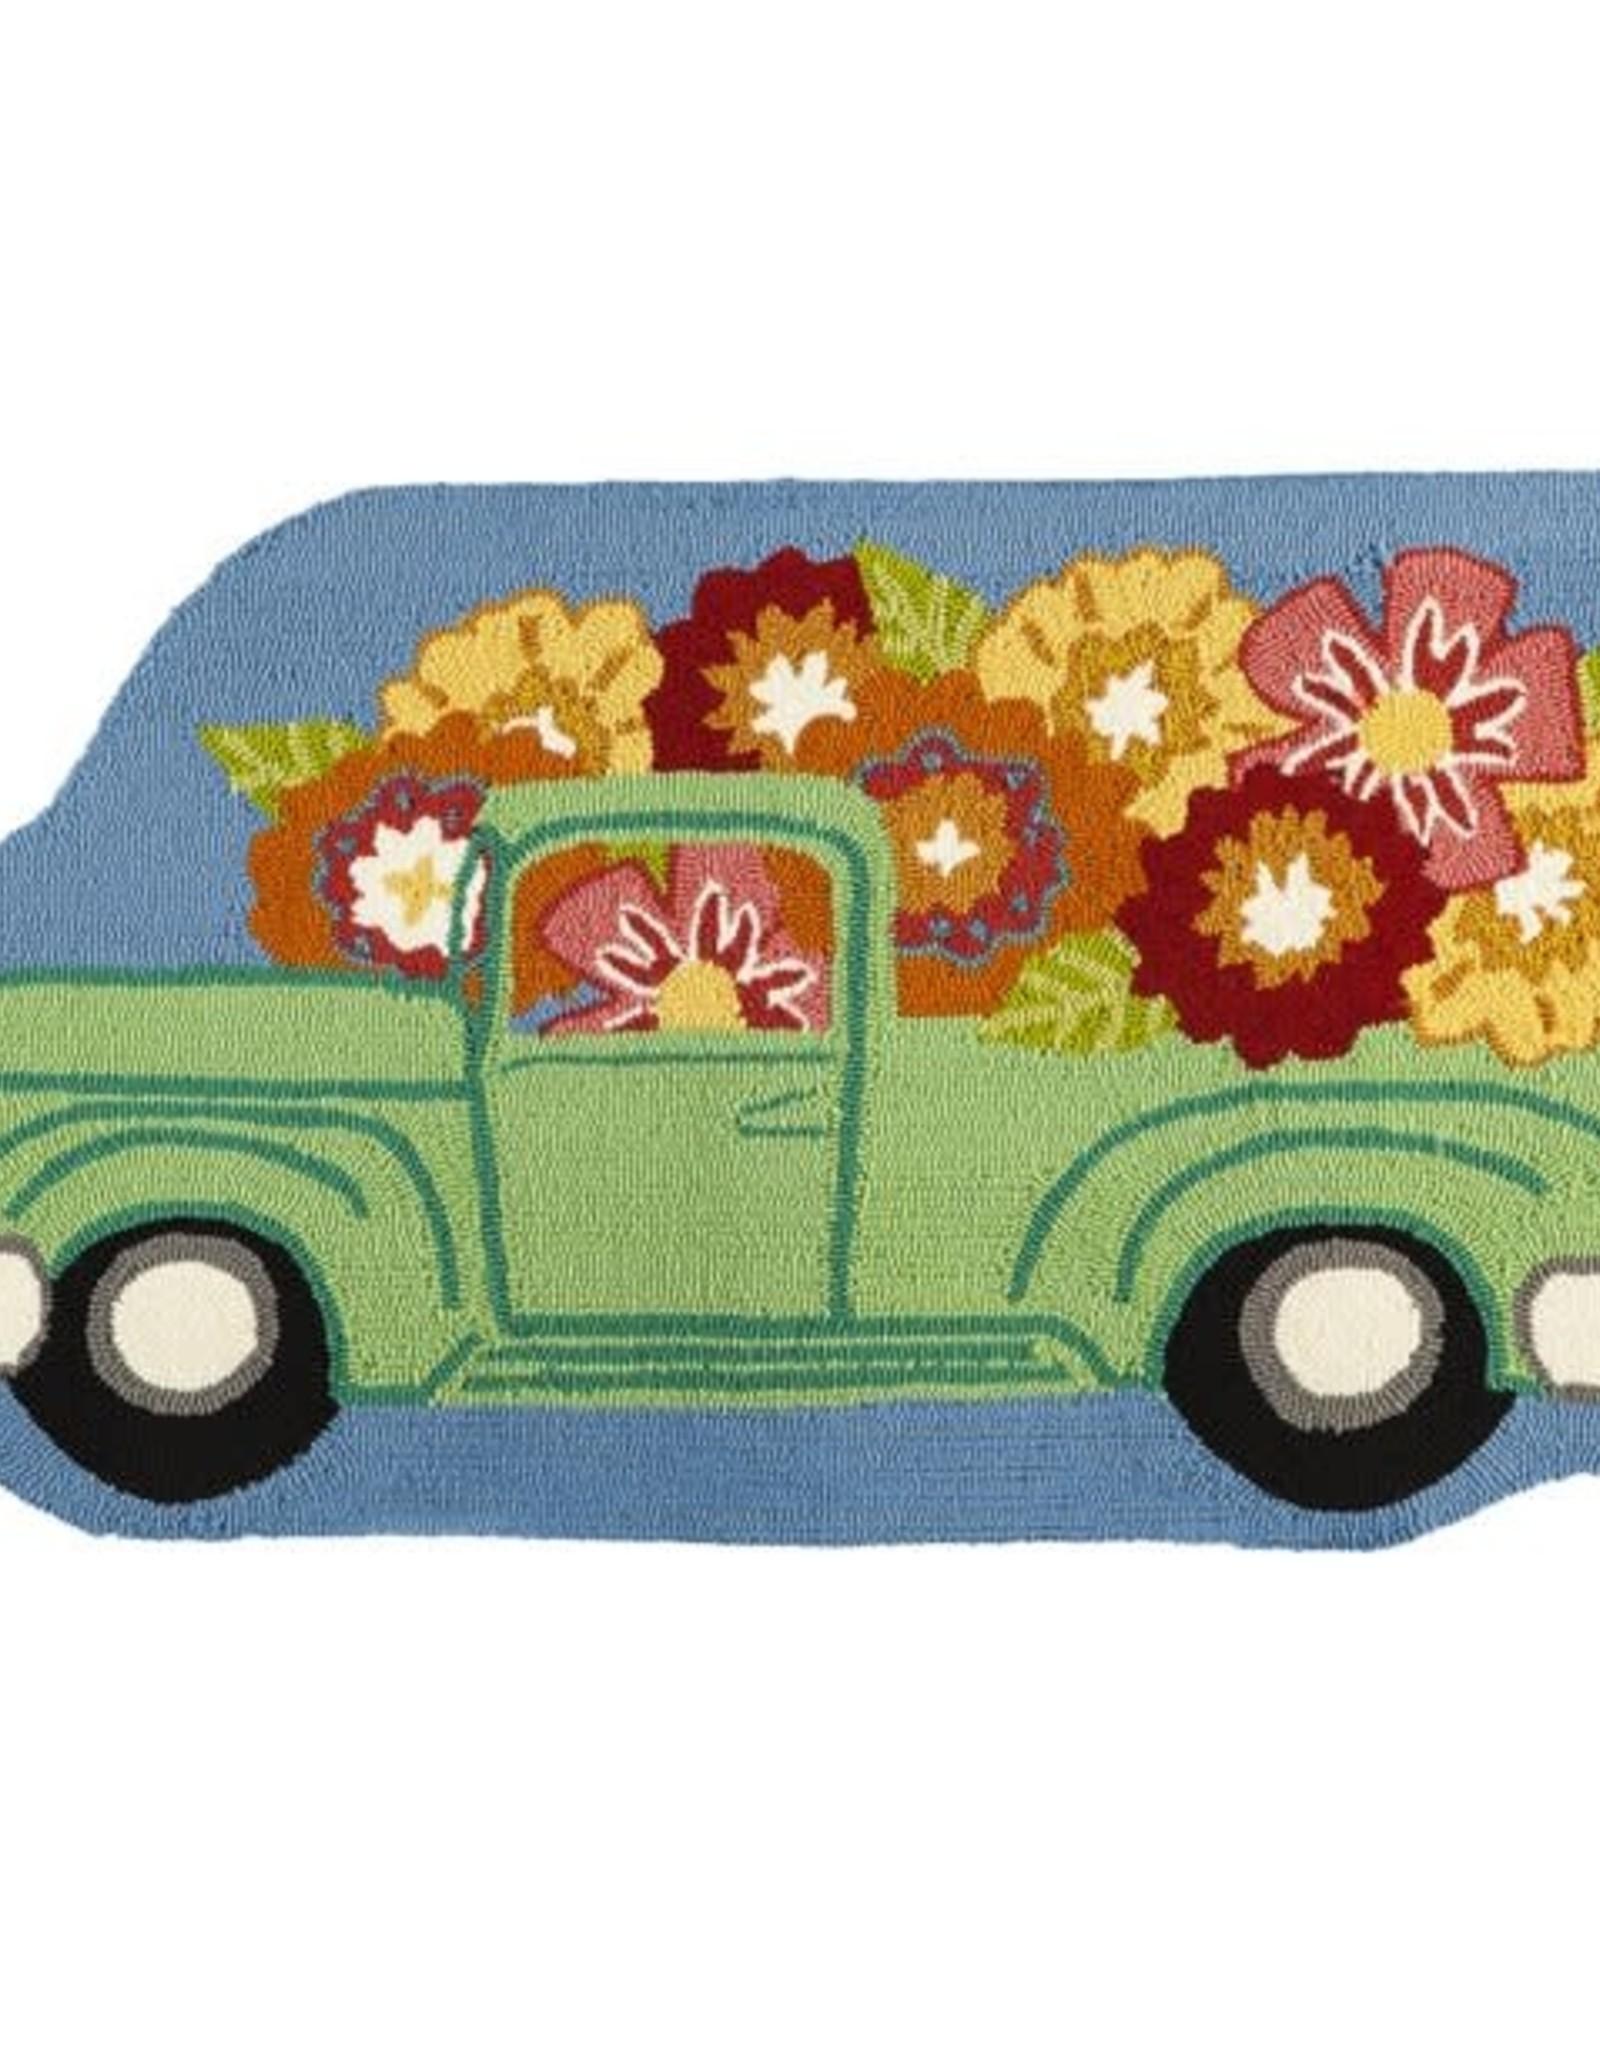 Flower Truck Shaped Hooked Rug